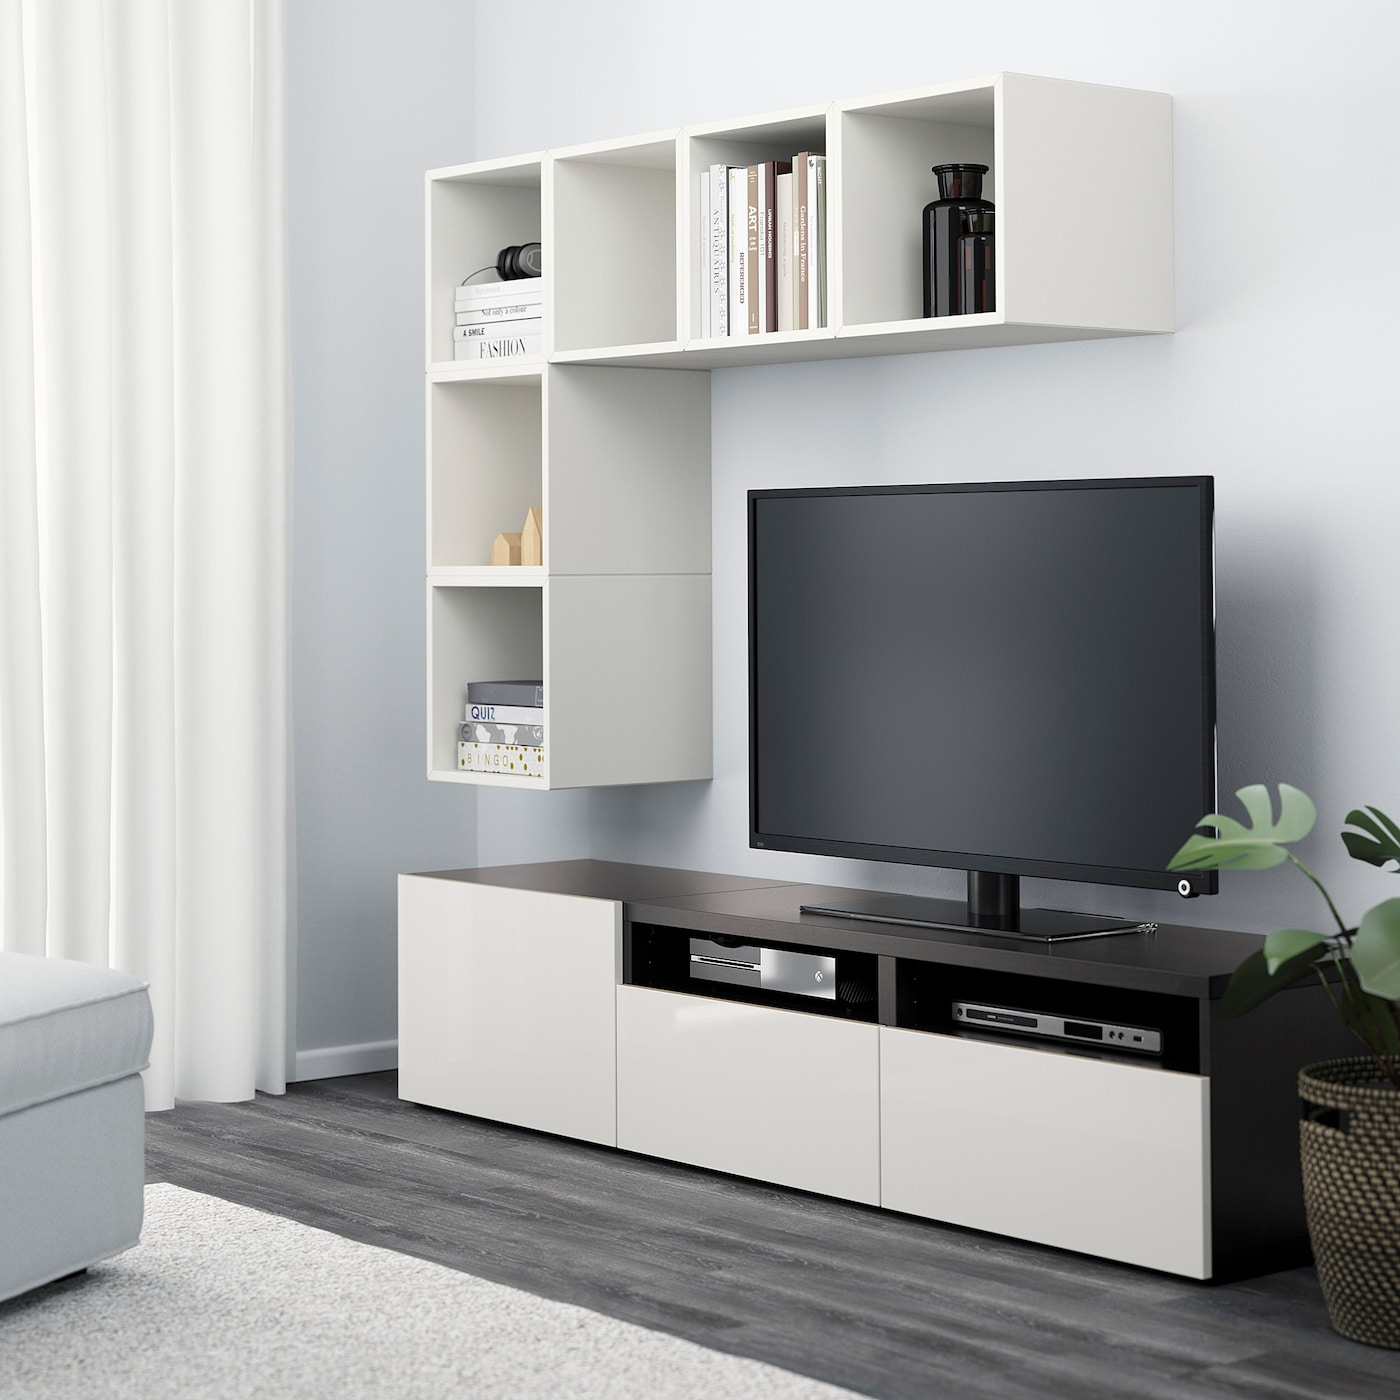 BESTÅ EKET Combinazione di mobili per tv biancomarrone nerolucidobianco 180x40x170 cm